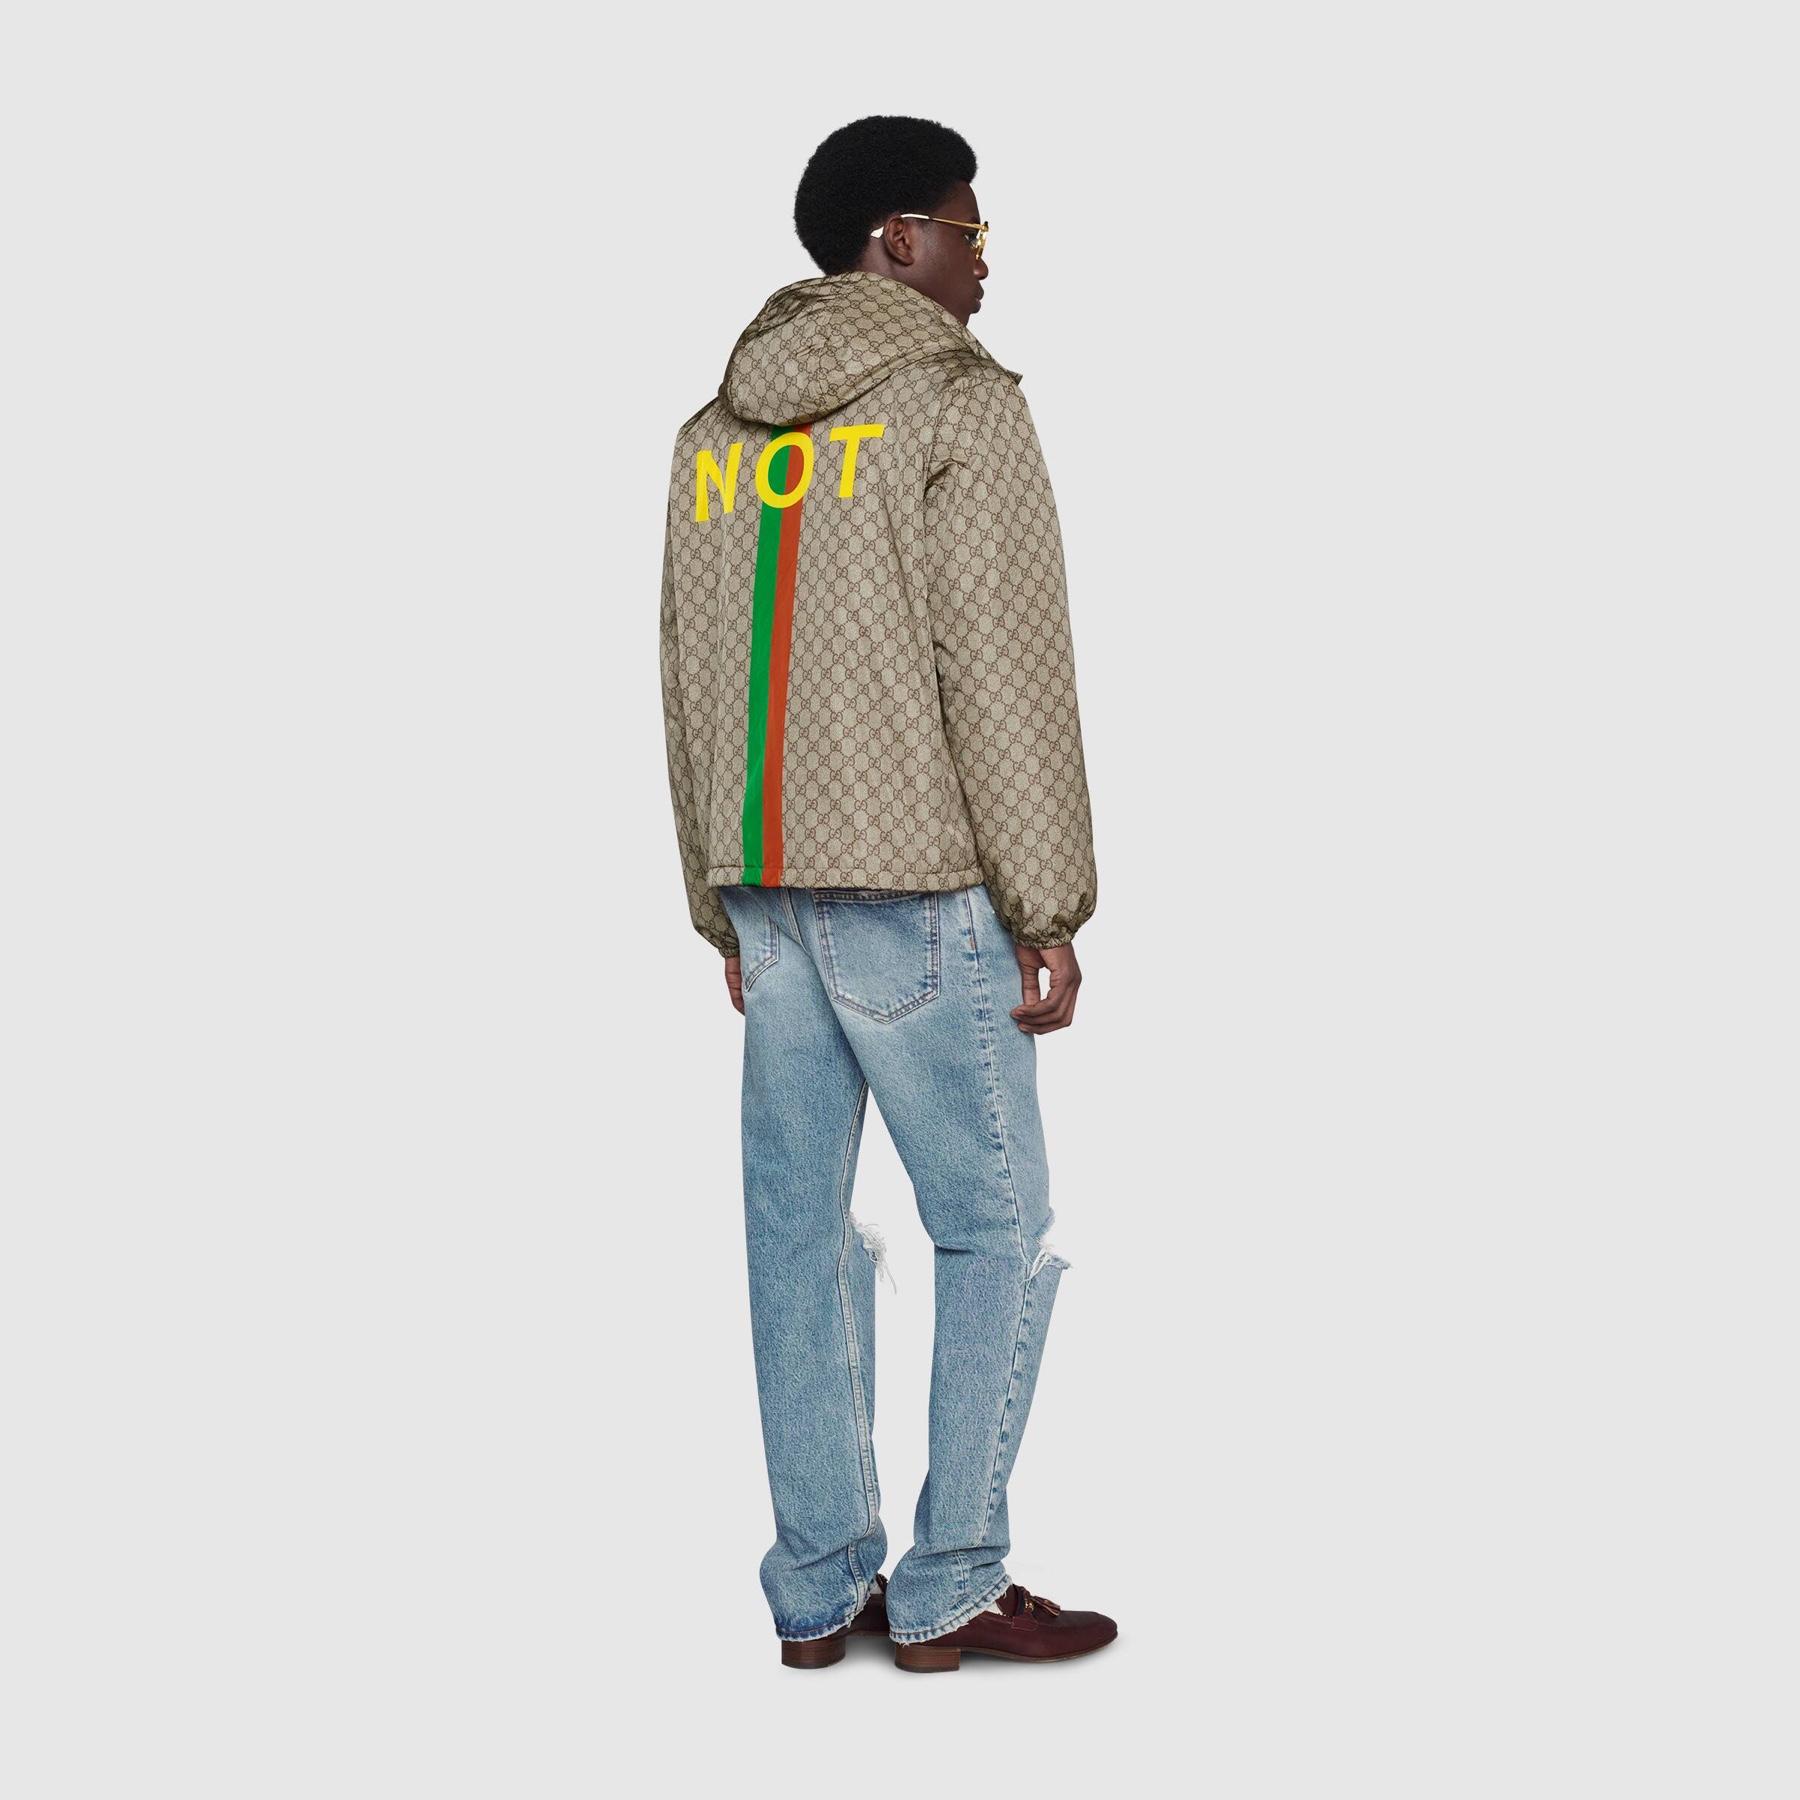 Gucci FAKE/NOT